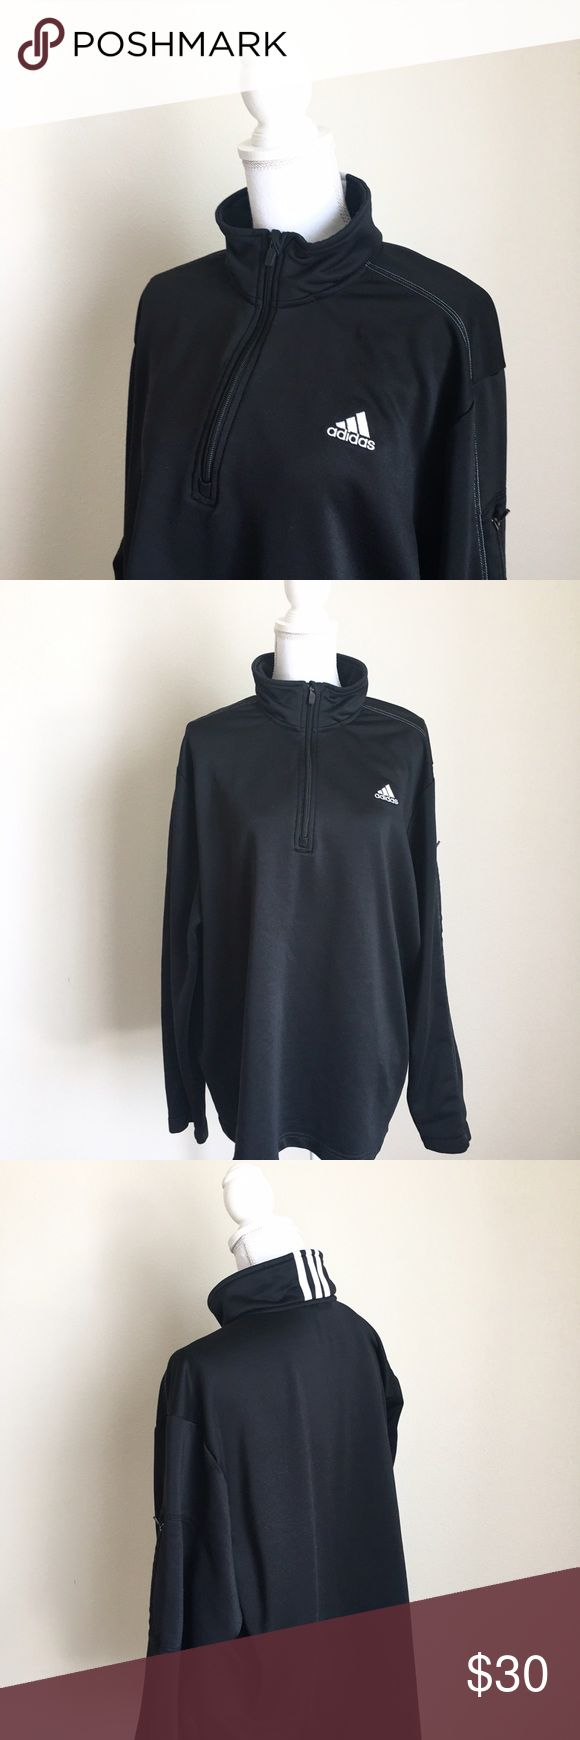 Adidas Half Zip Sweater ✨ Adidas Half Zip Sweater - Warm & comfortable - Plus size 2X ✨ Adidas Sweaters